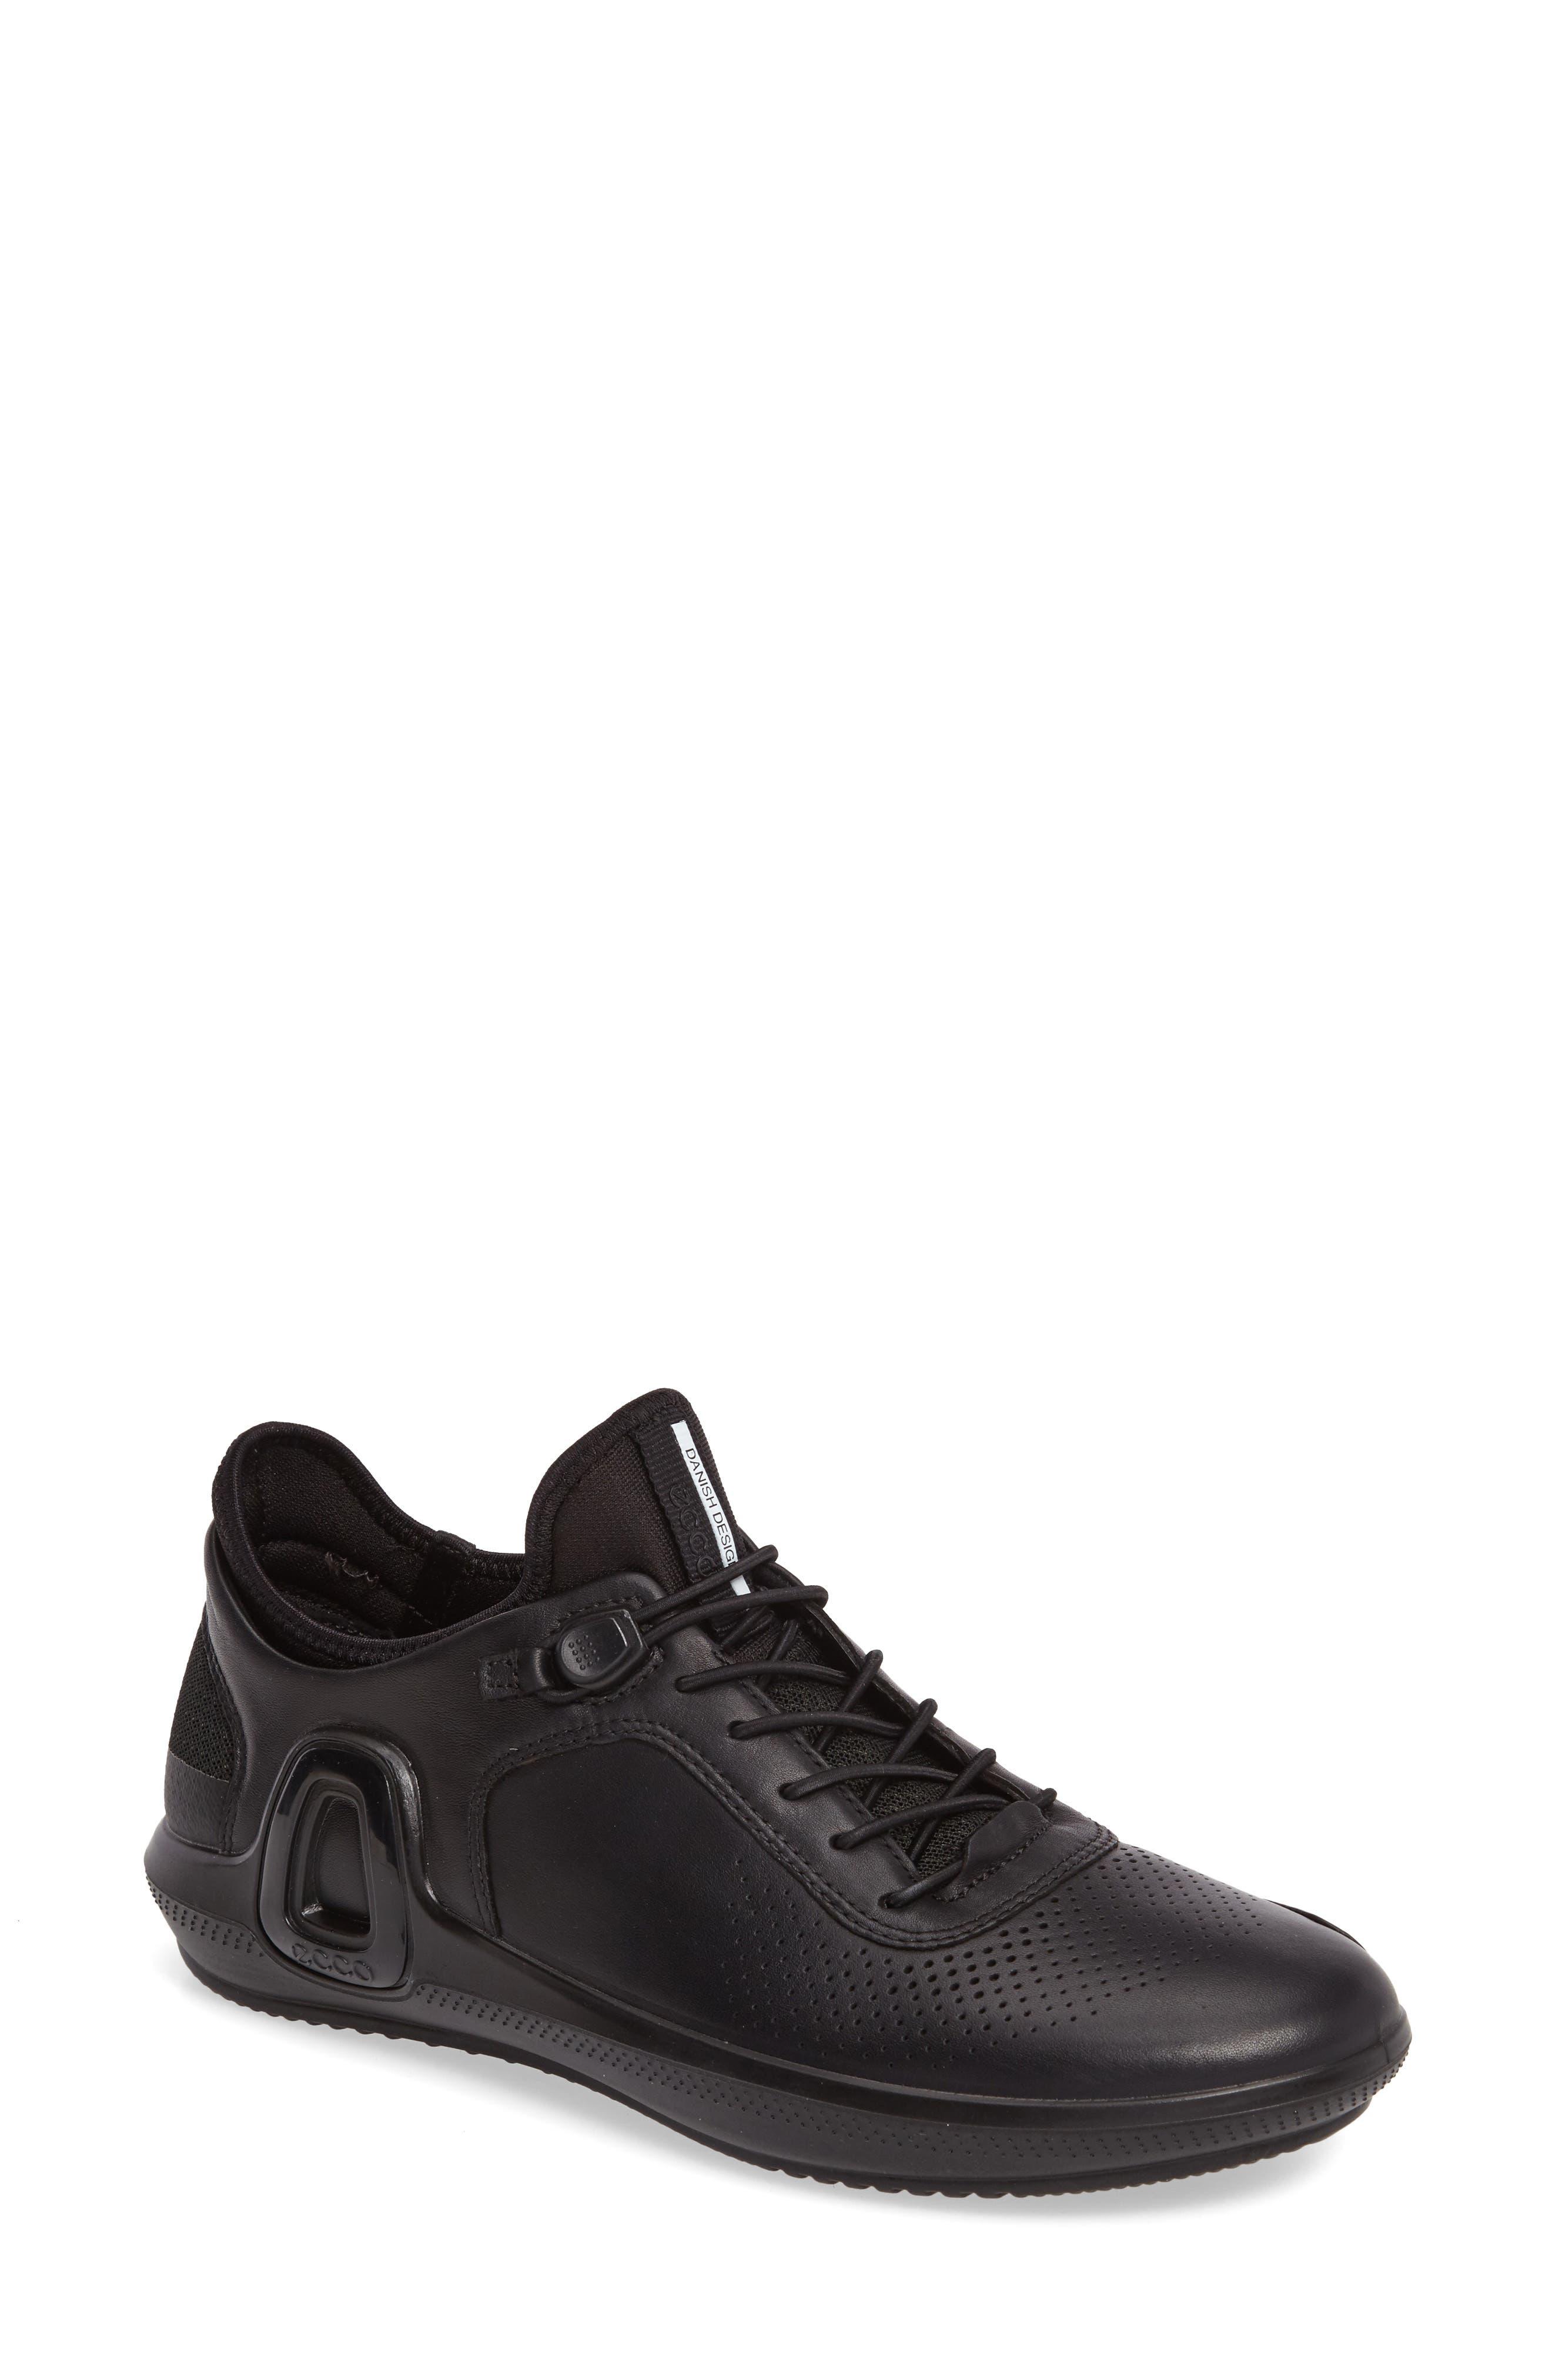 Intrinsic 3 Sneaker,                         Main,                         color, 002